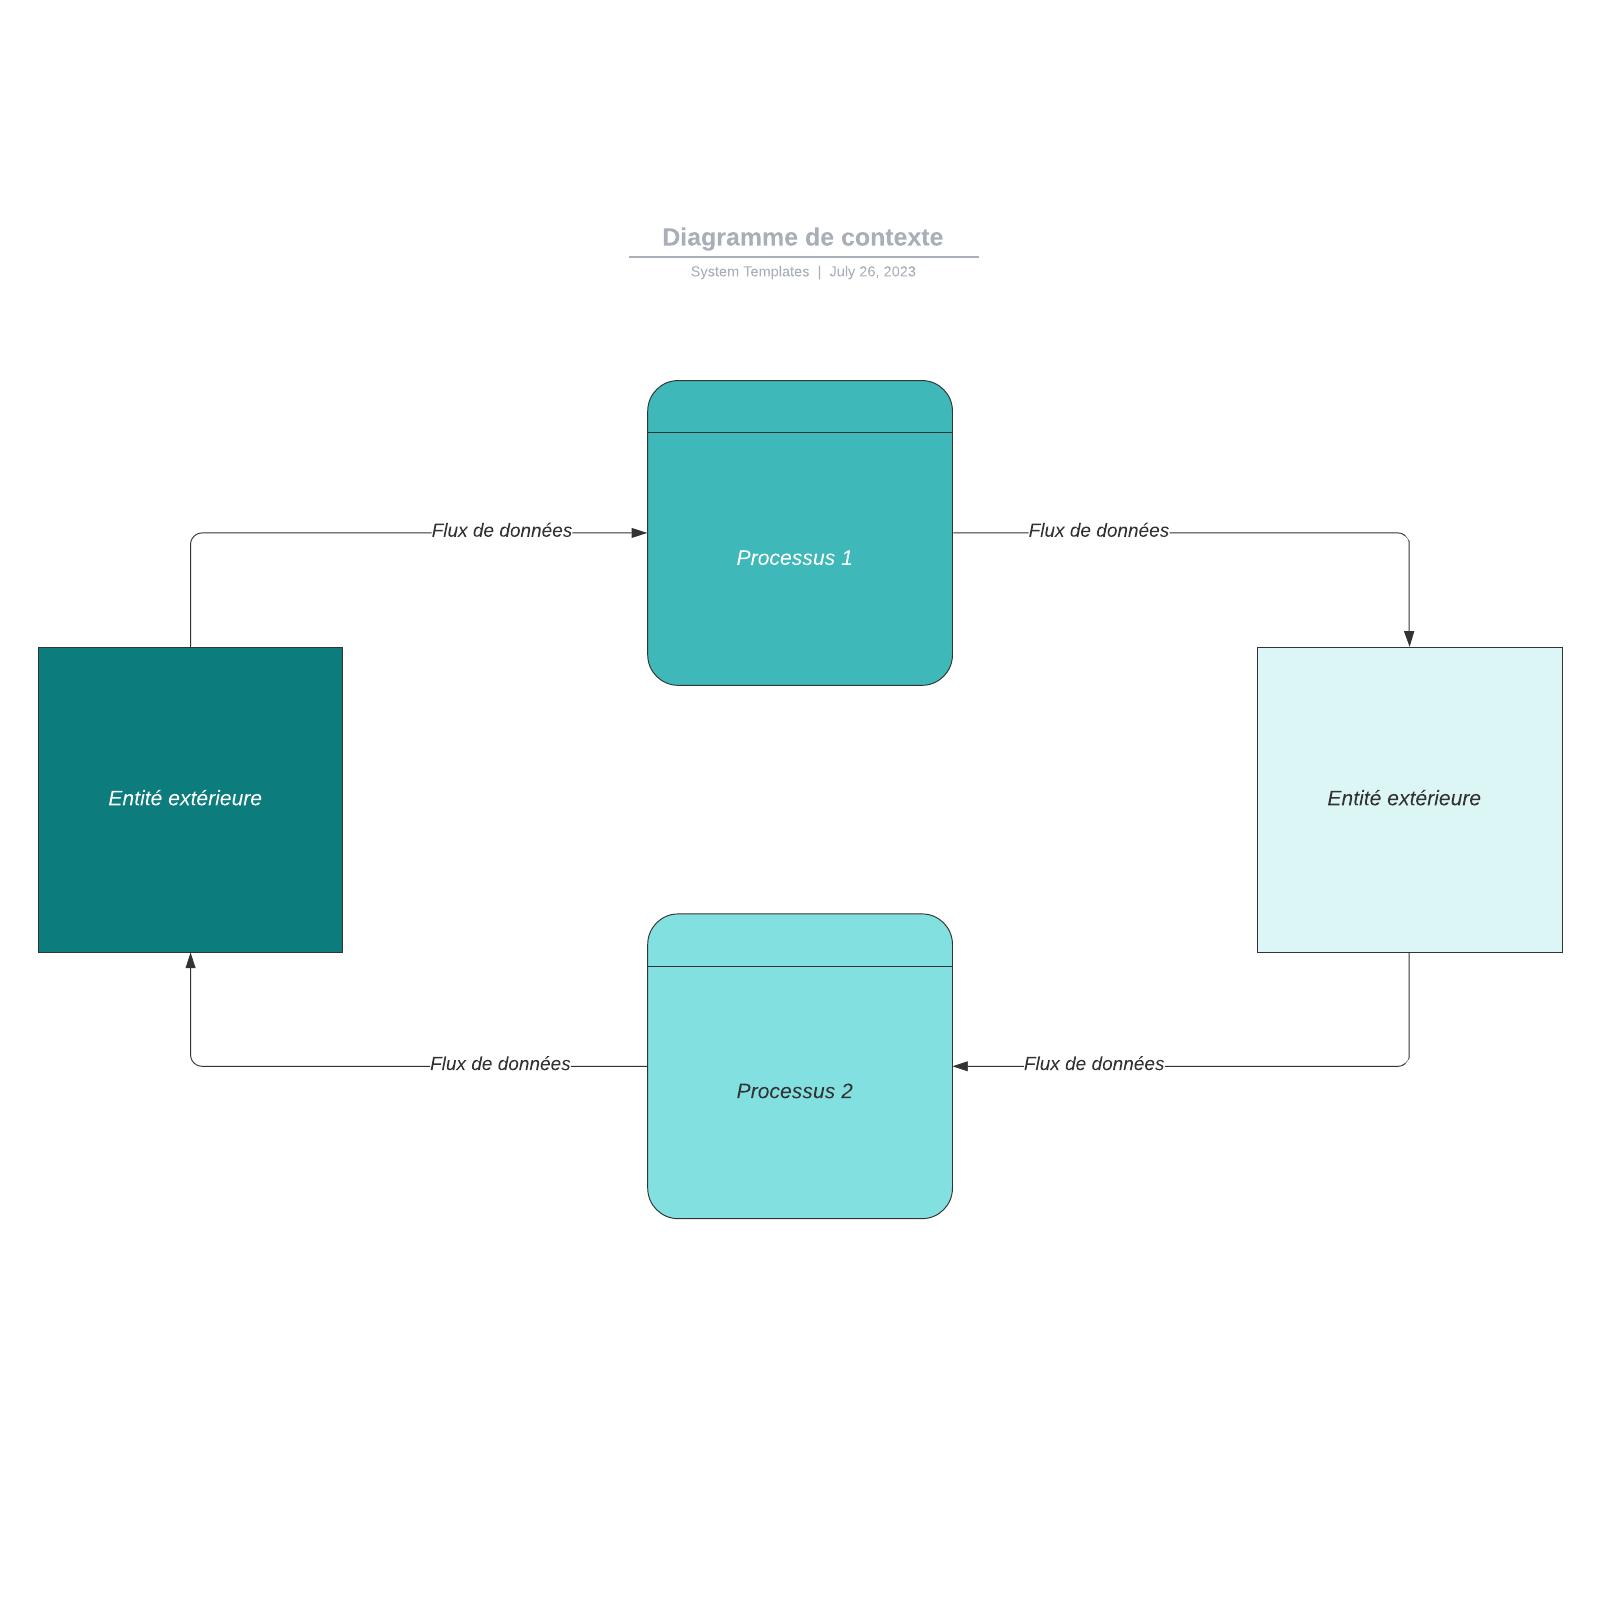 exemple de diagramme de contexte vierge